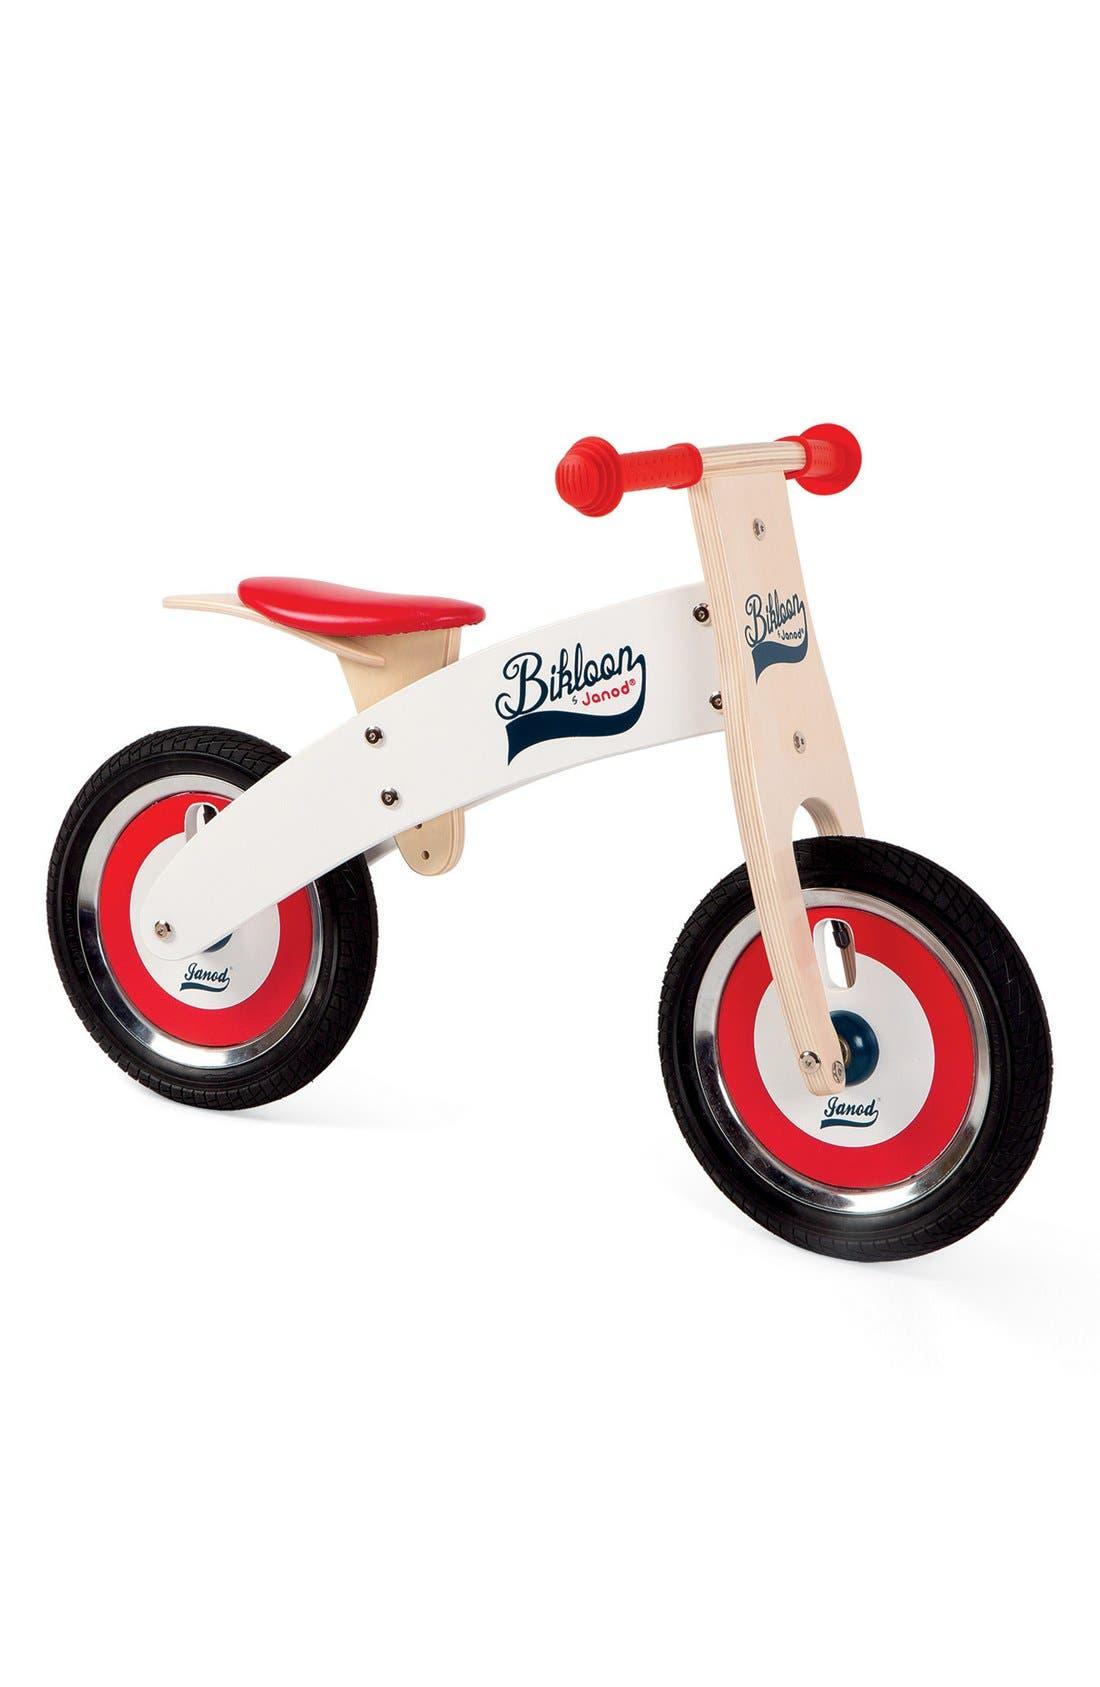 'Bikloon' Balance Bike,                             Alternate thumbnail 3, color,                             RED